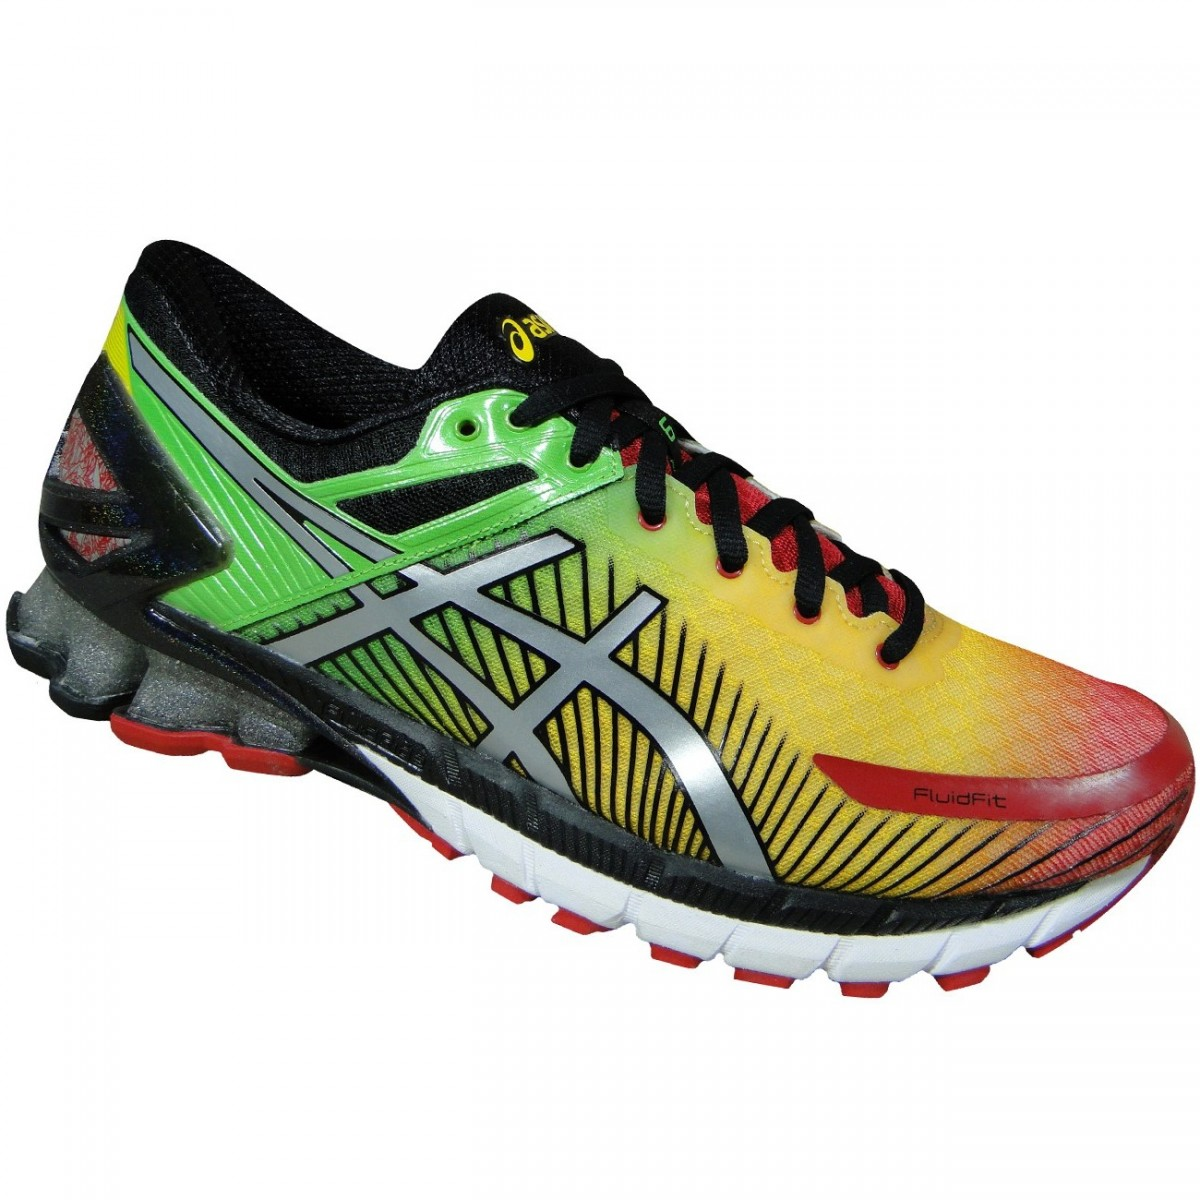 5e9c38e6ace Tenis Asics Gel-Kinsei 6 T644N 2493 - Verde Amarelo Vermelho - Chuteira  Nike